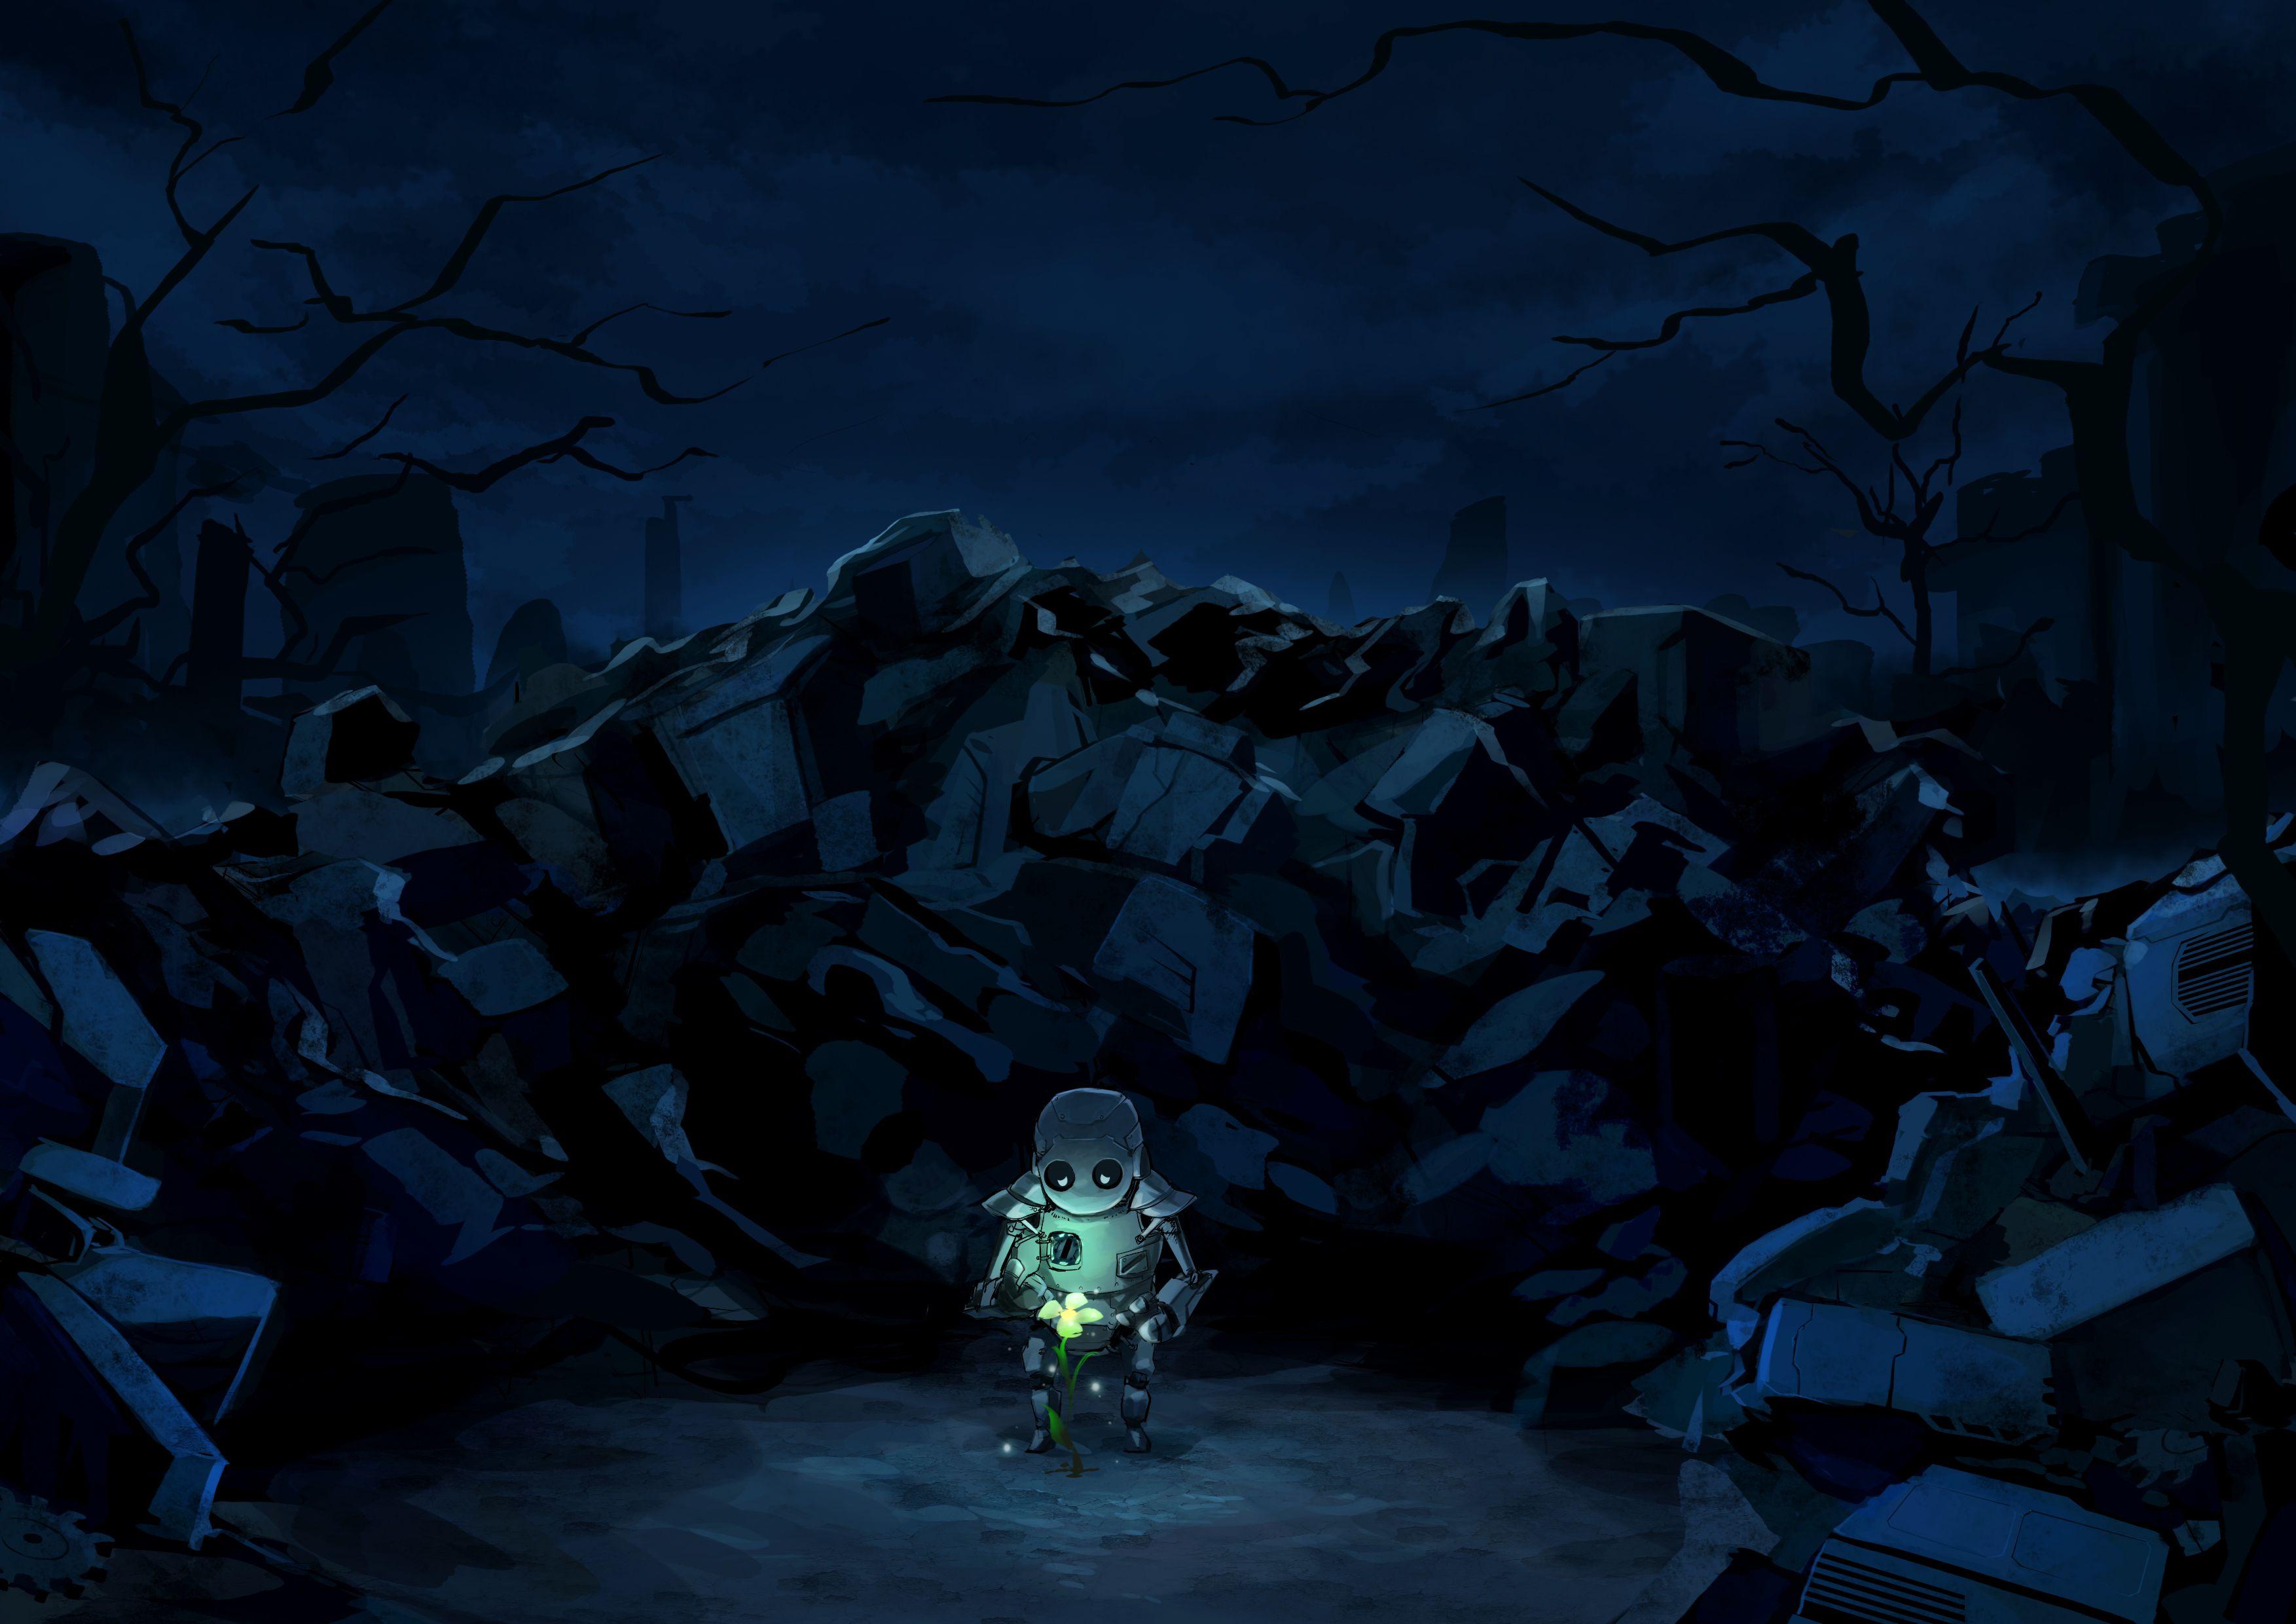 Dark Anime Scenery Amazing Wallpapers Autobackgrounds Star Light